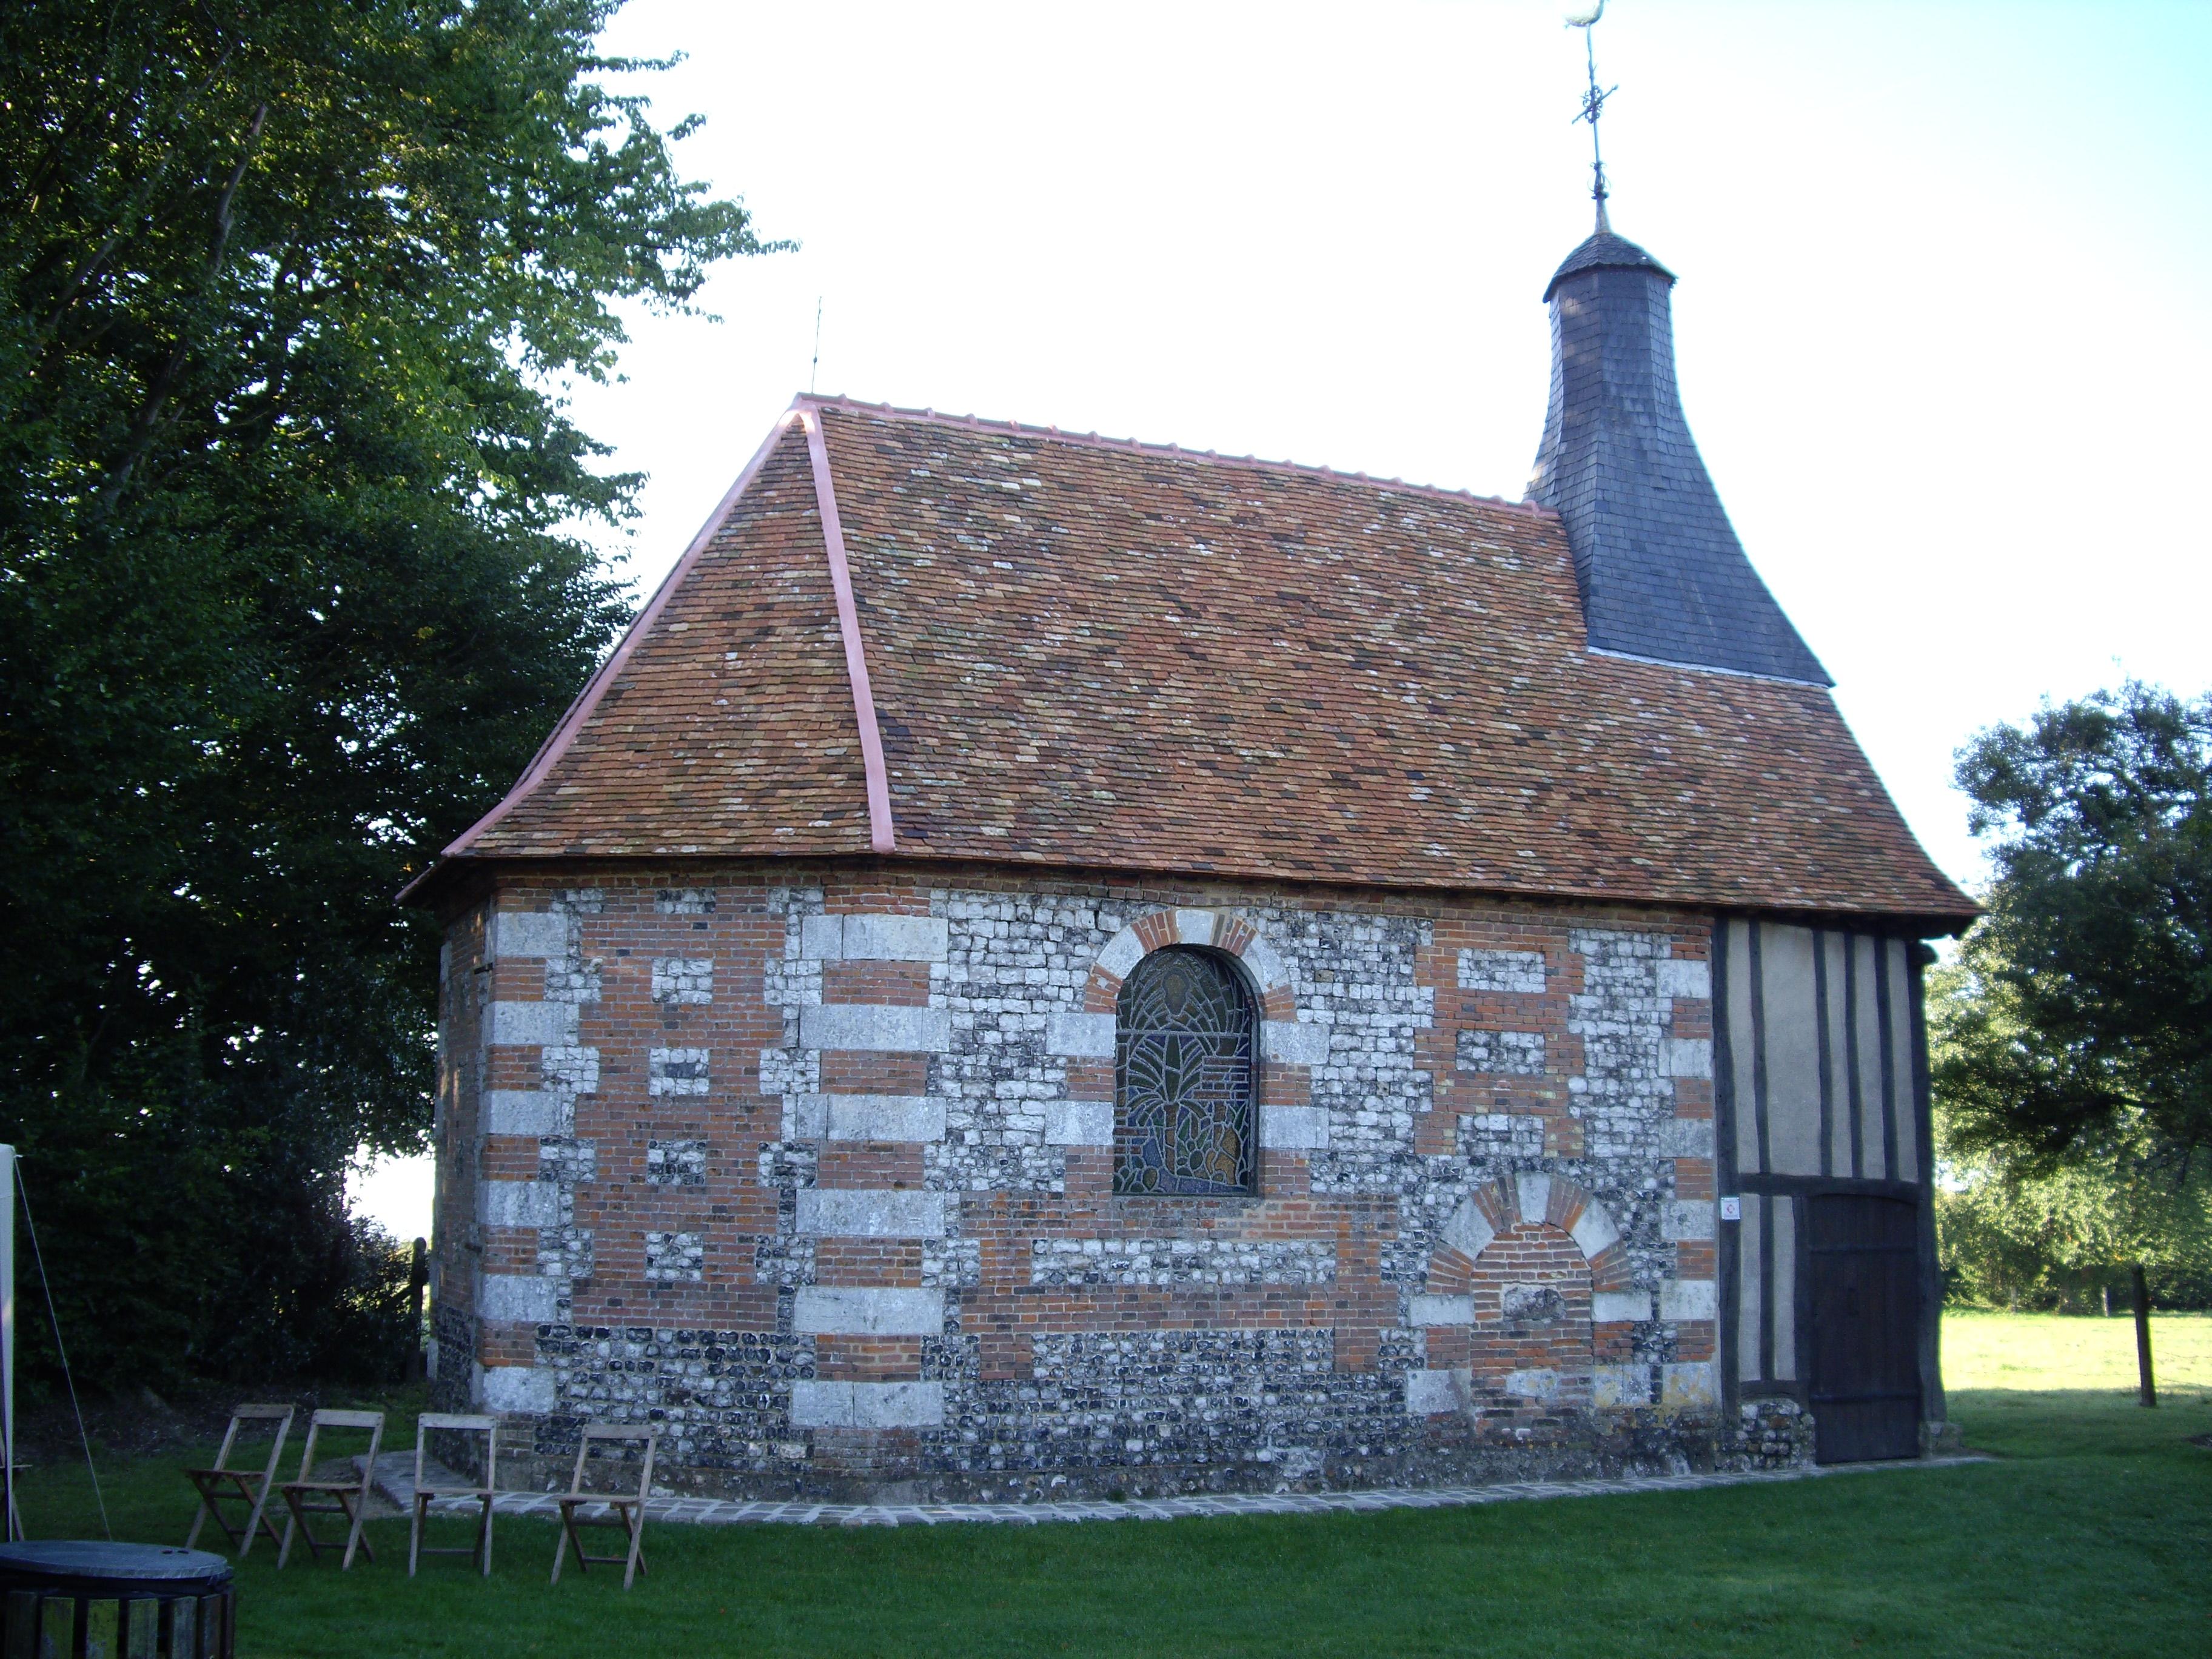 Chapelle-en-vieille-tuiles-normande